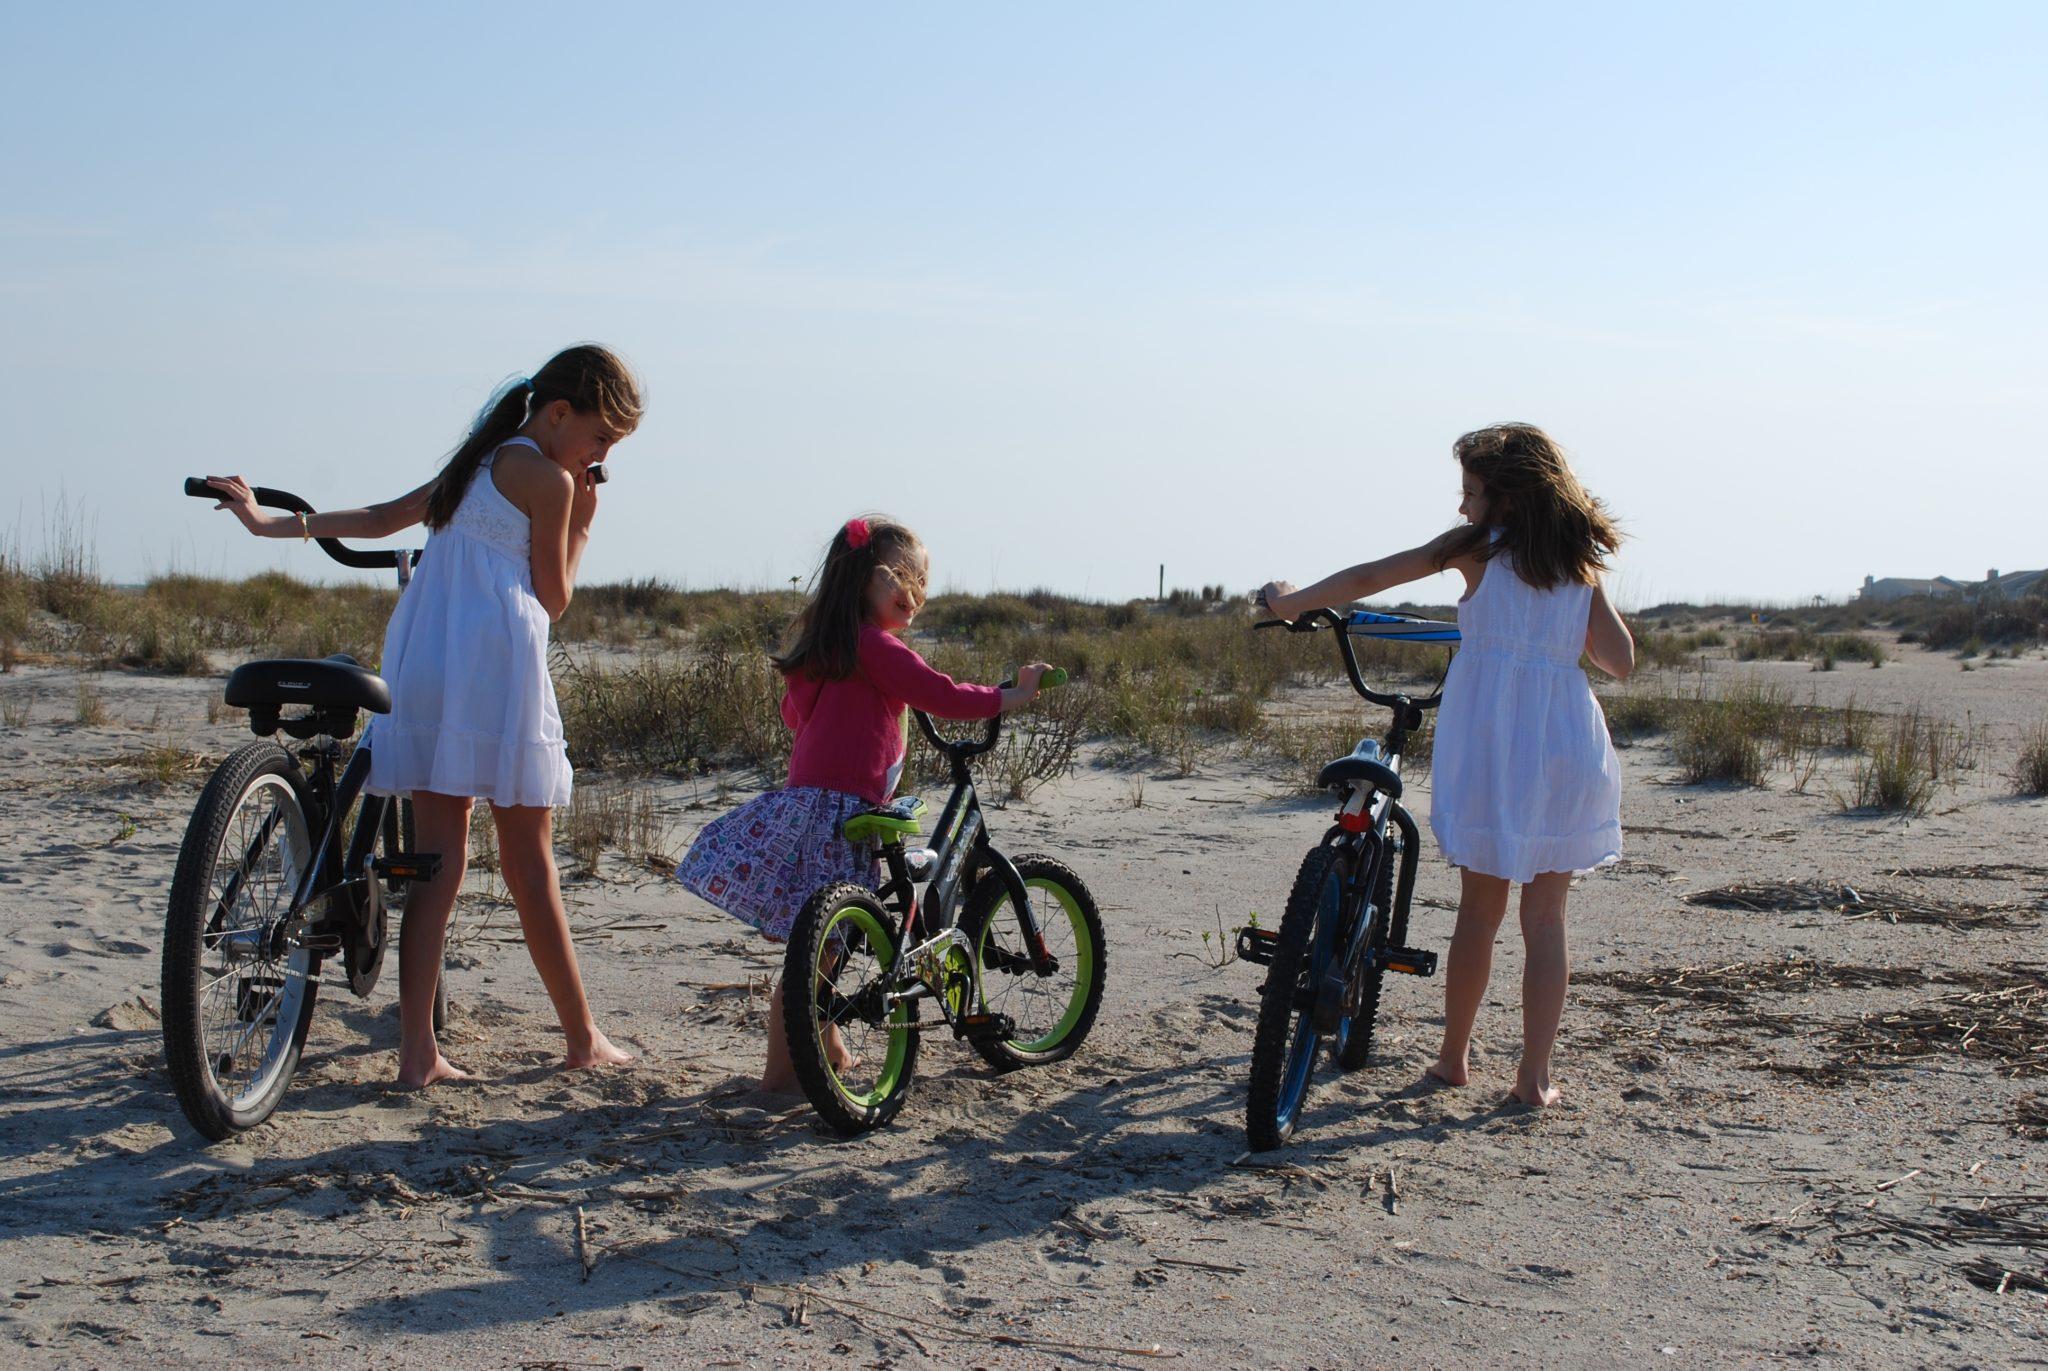 Bikes Isle of Palms, SC